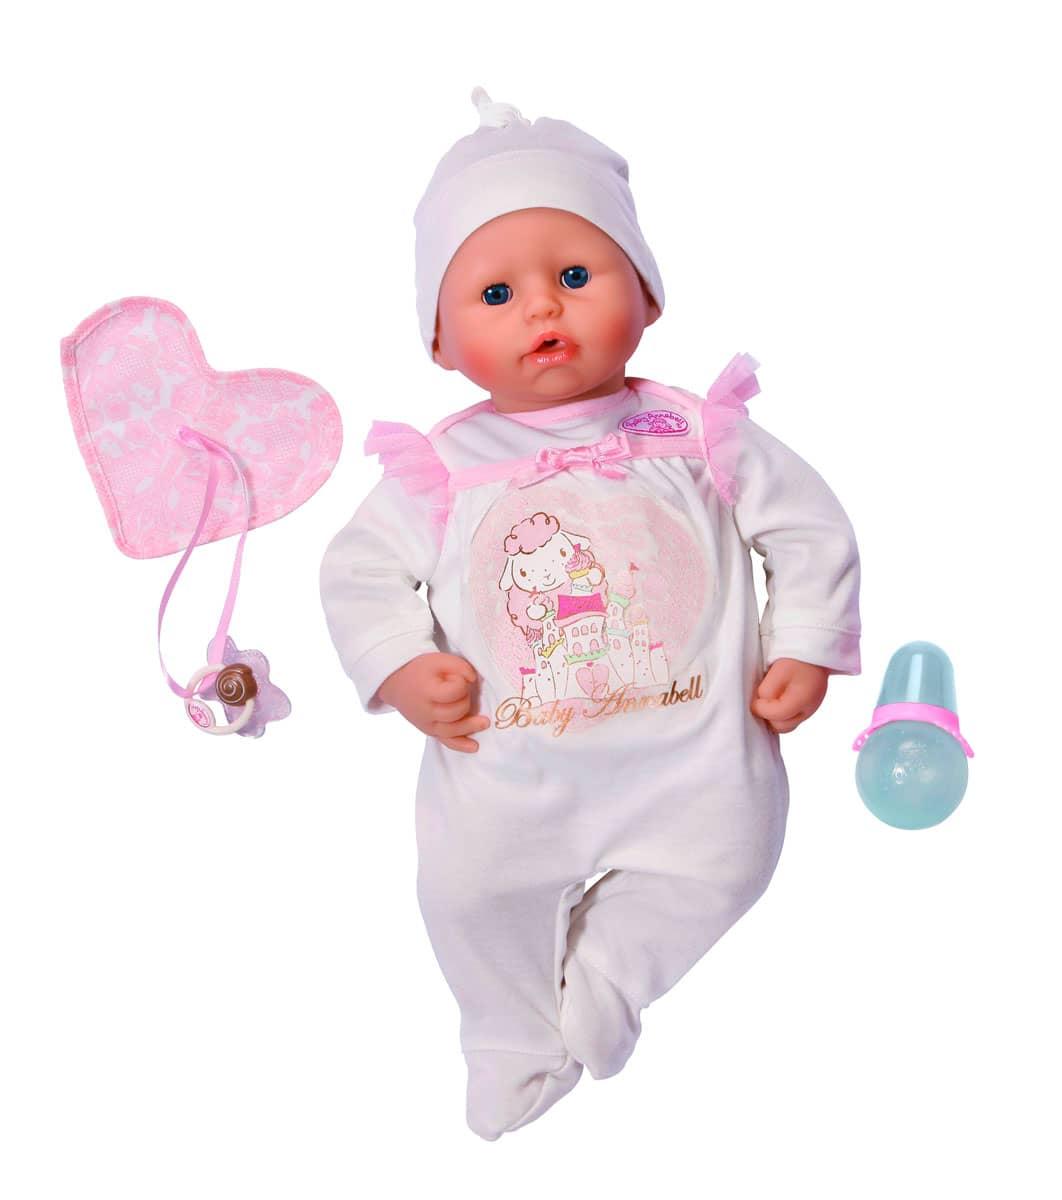 Baby annabell interactive zapf creation